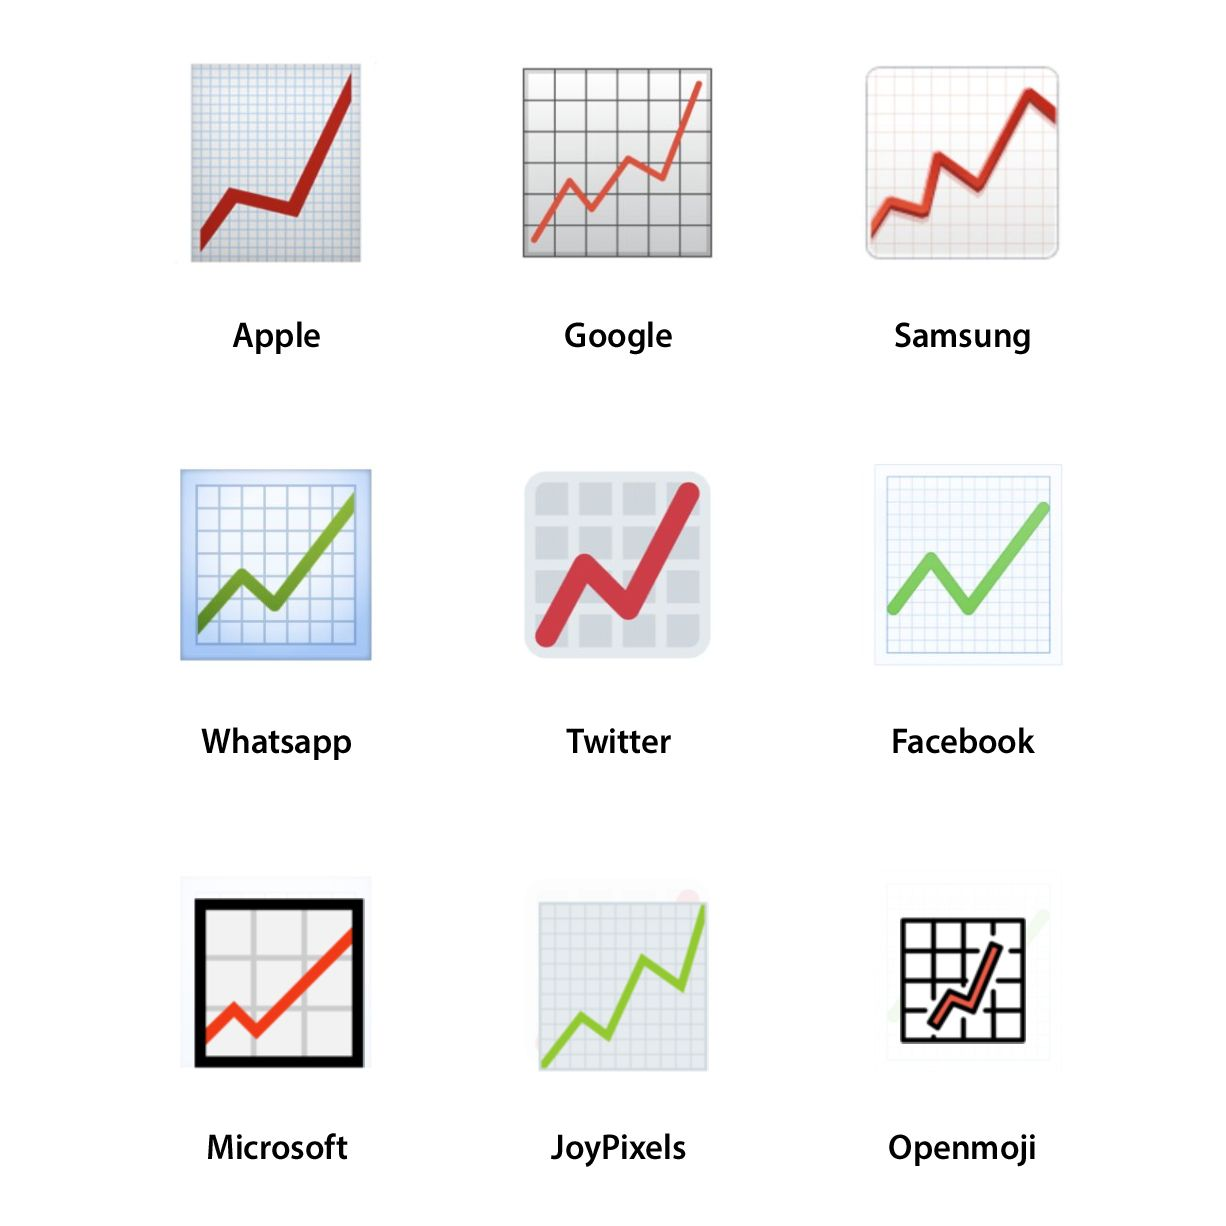 Emojipedia-Red-Chart-Increasing-Vendor-Comparison